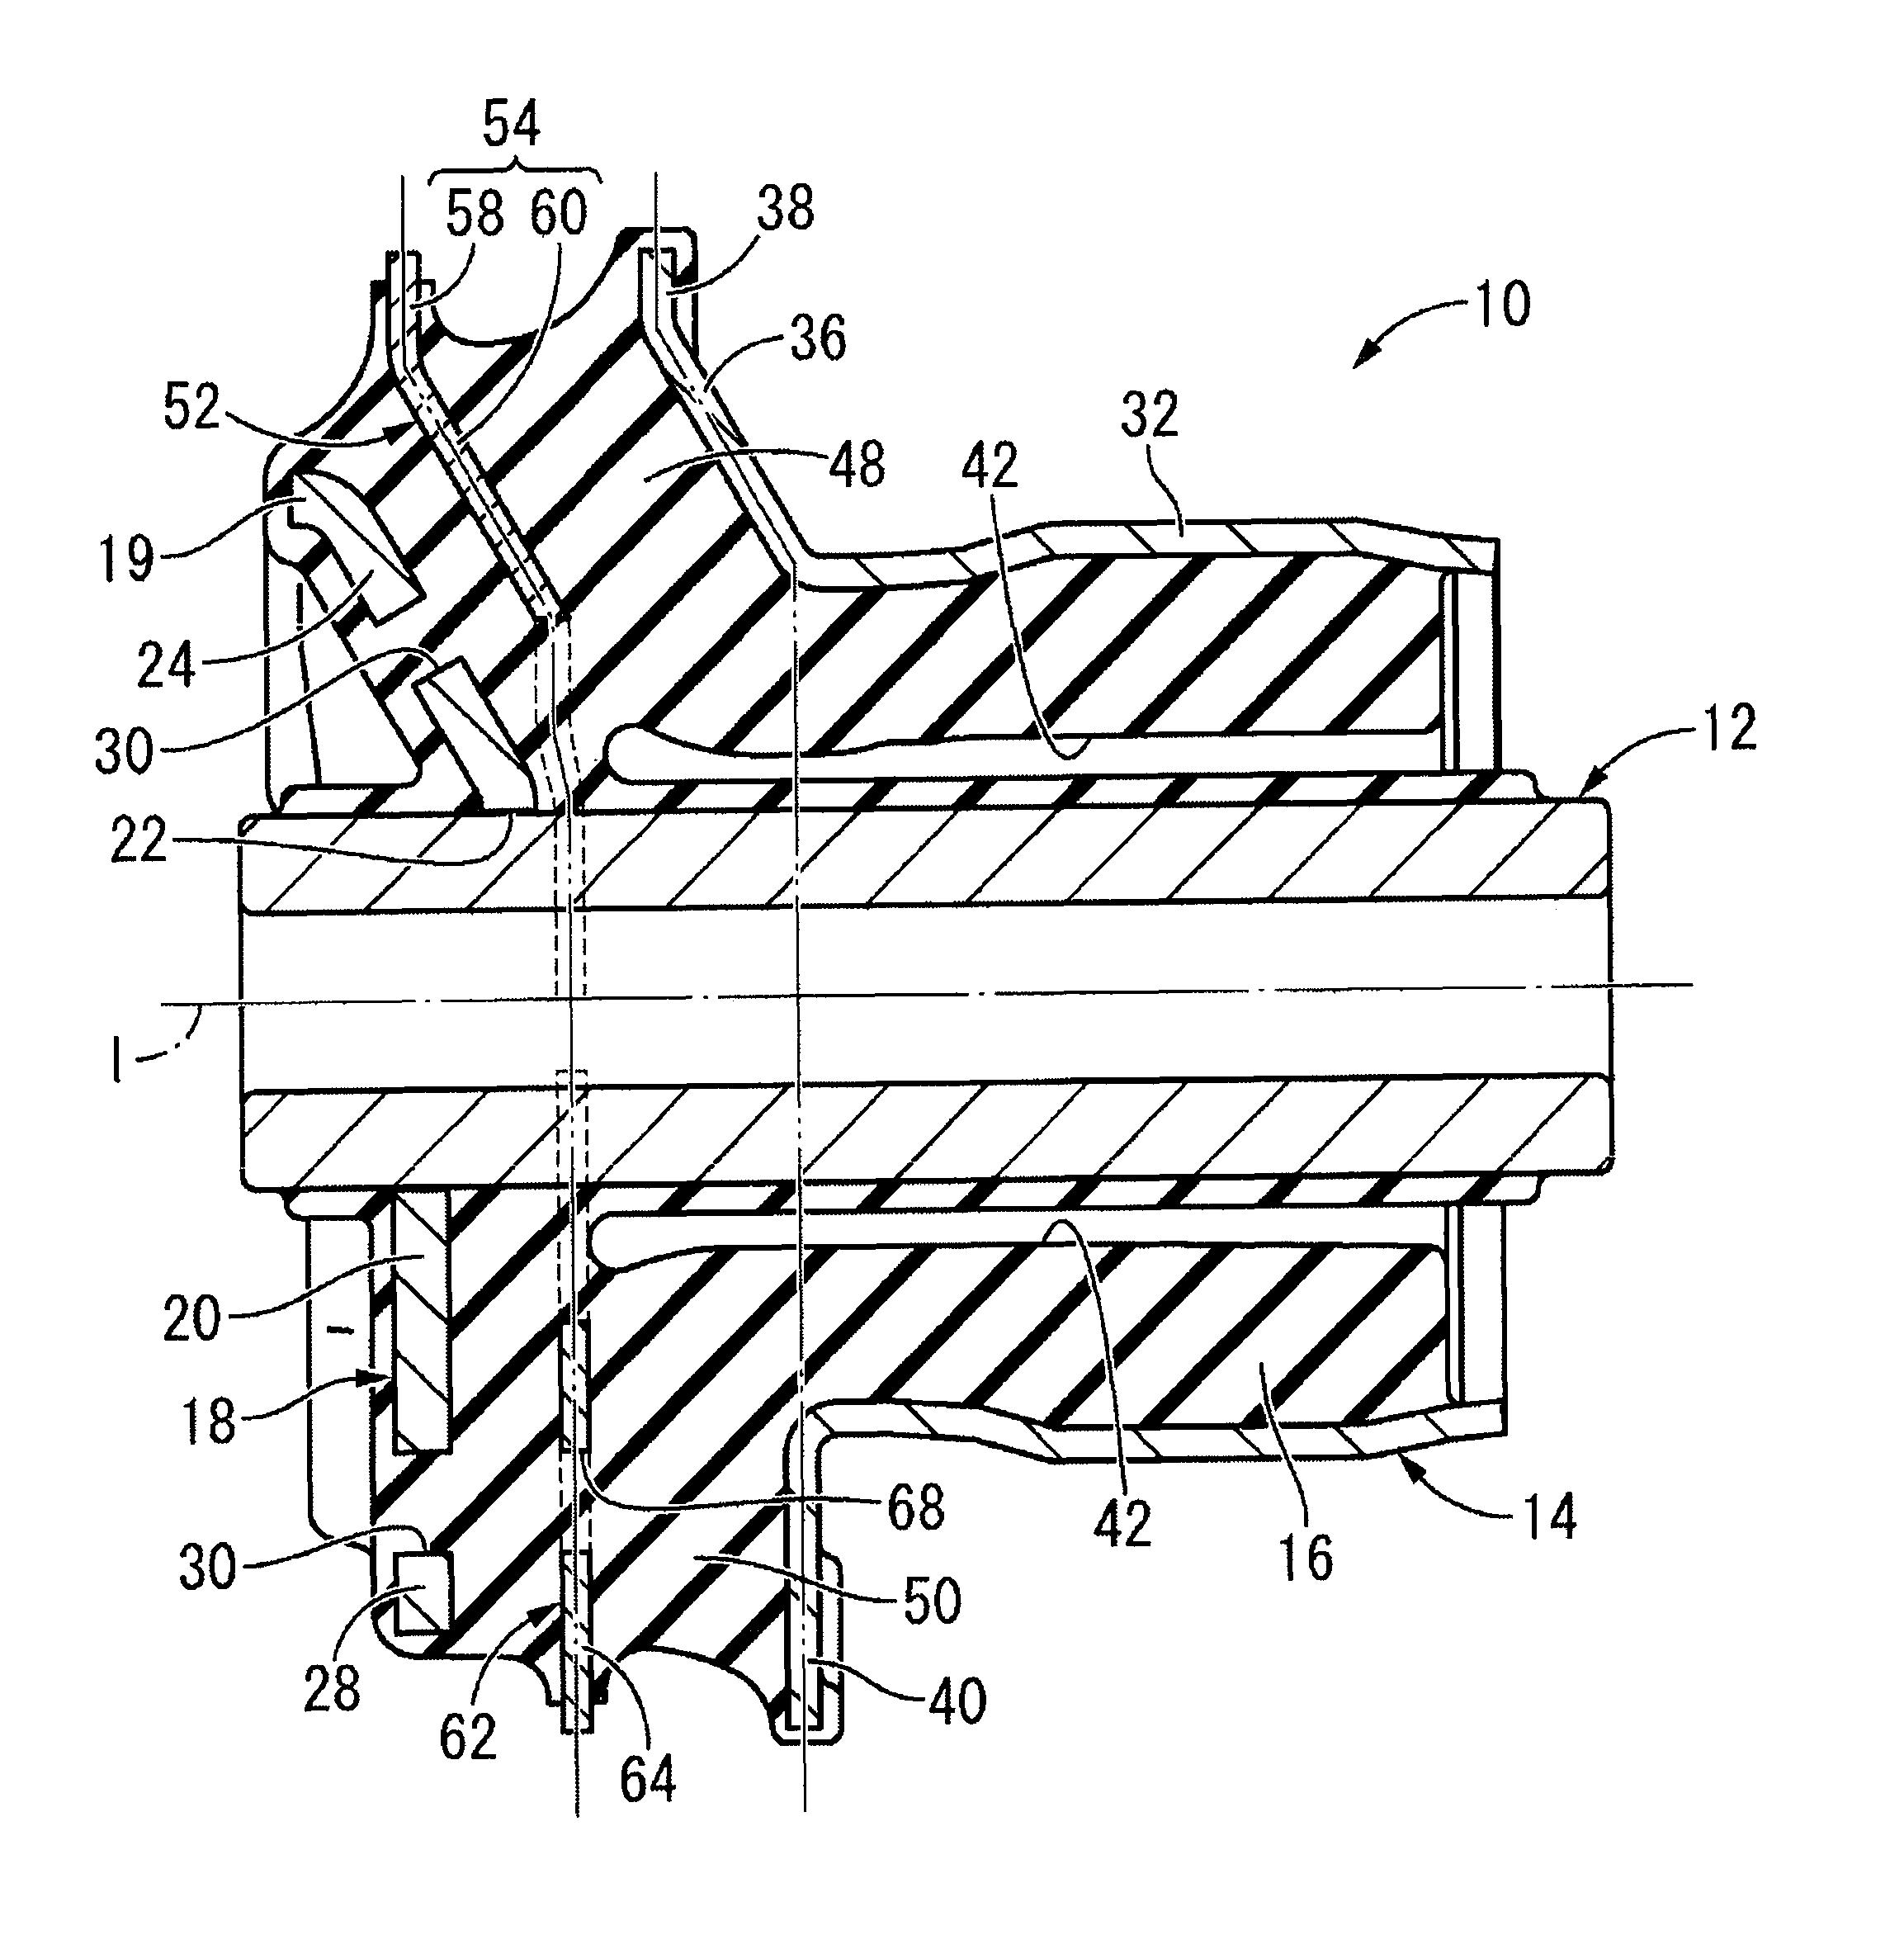 patente us8517404 toe correct bush patentes Steel I-beam Chart patent drawing